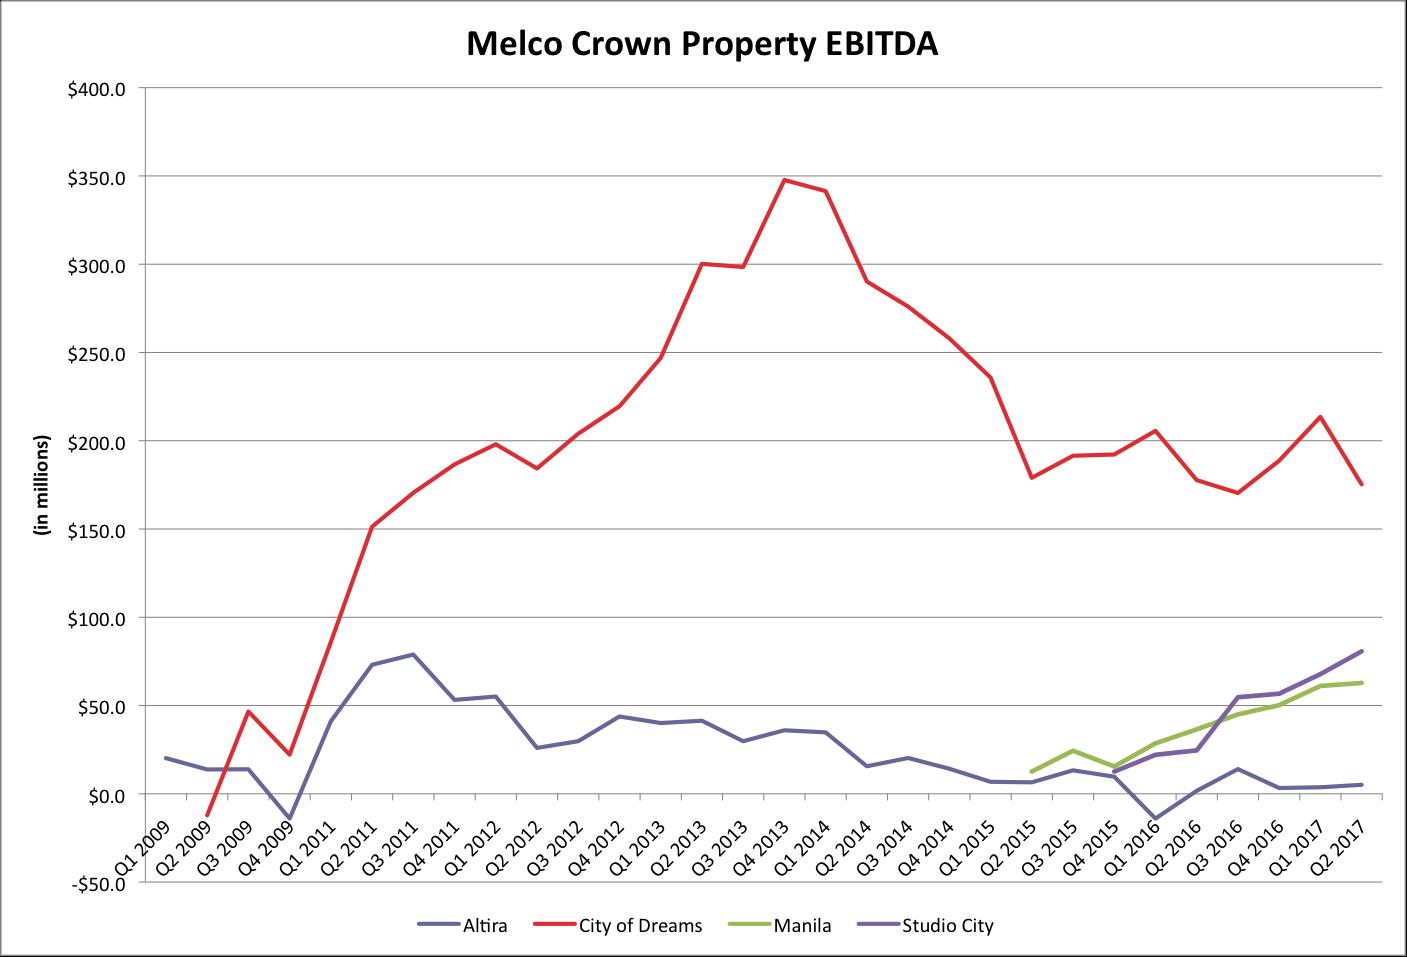 Chart of Melco Resorts's quarterly EBITDA by resort.